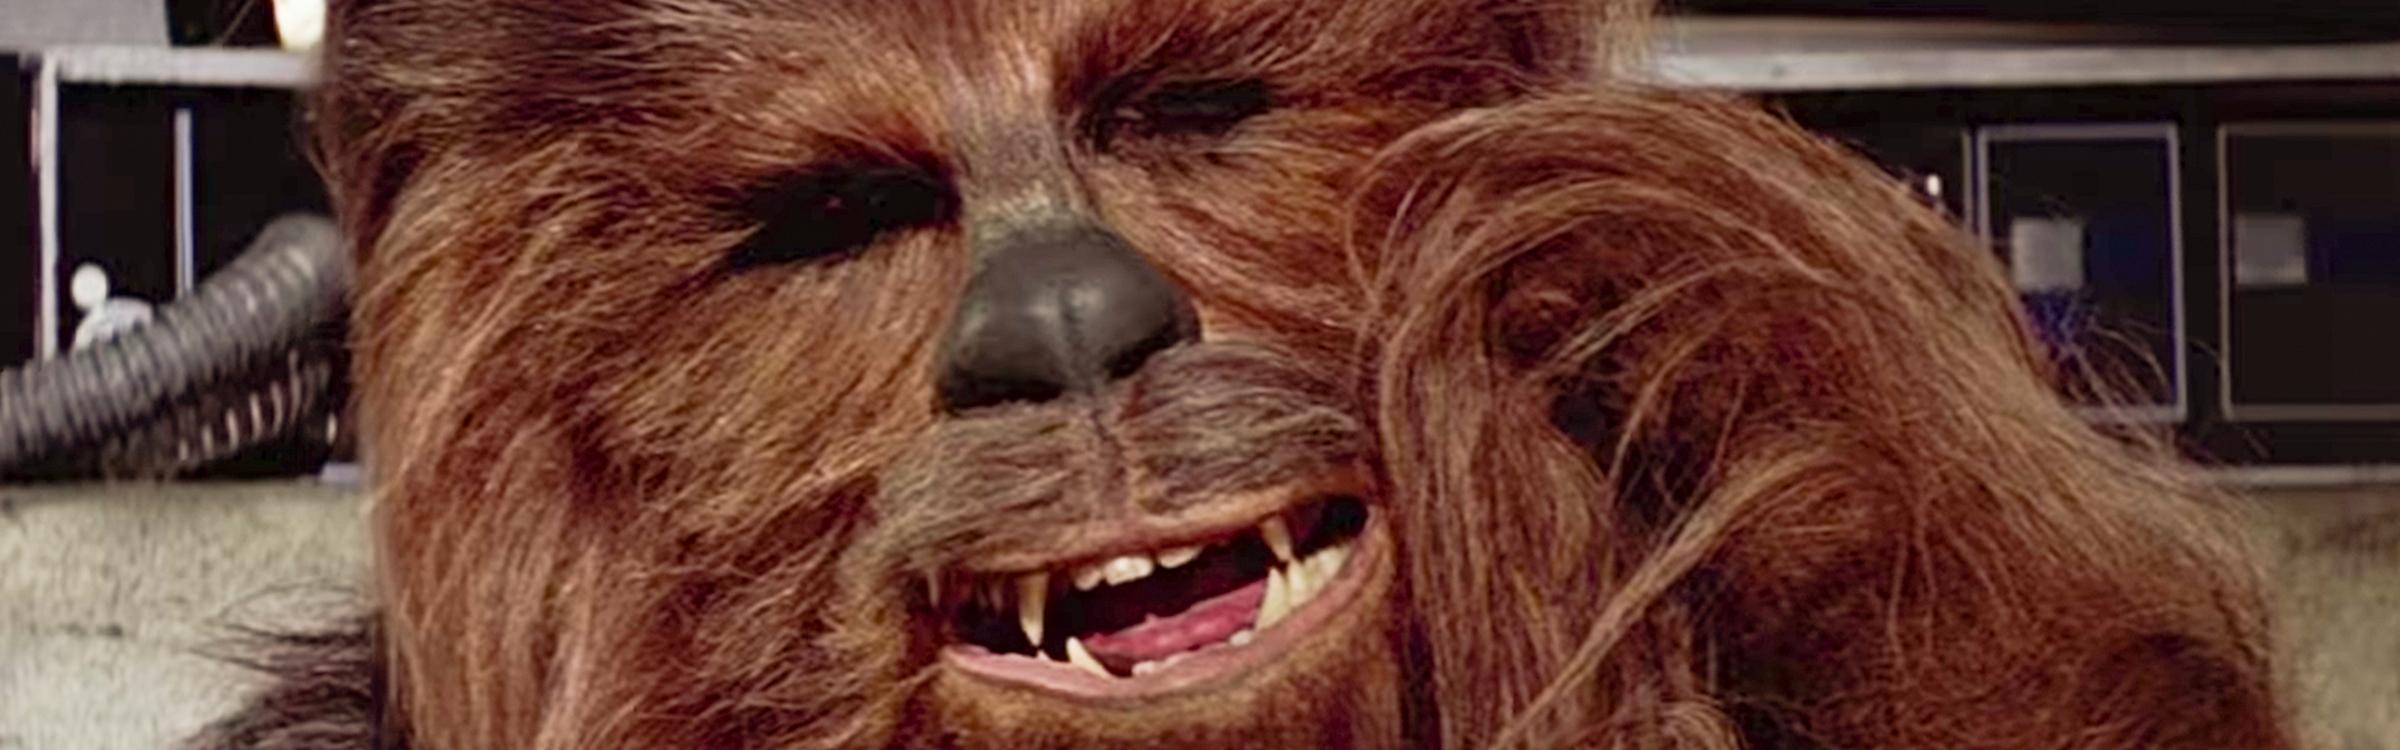 Header chewbacca